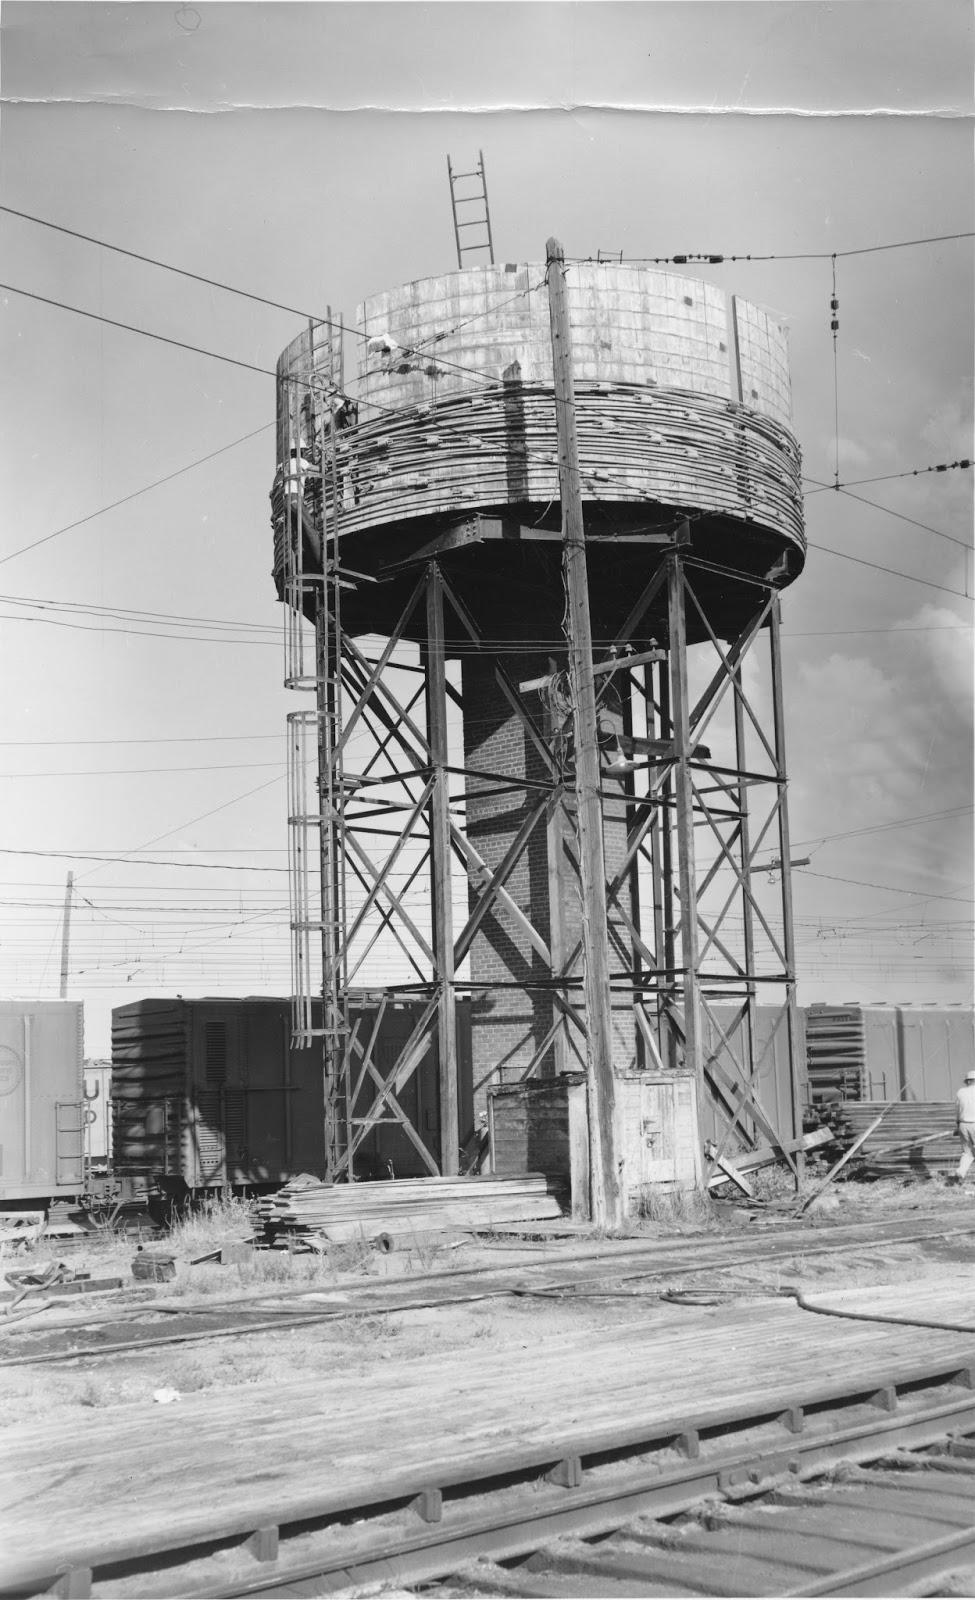 Water Tank Demolition : Big bend railroad history othello water tank demolition